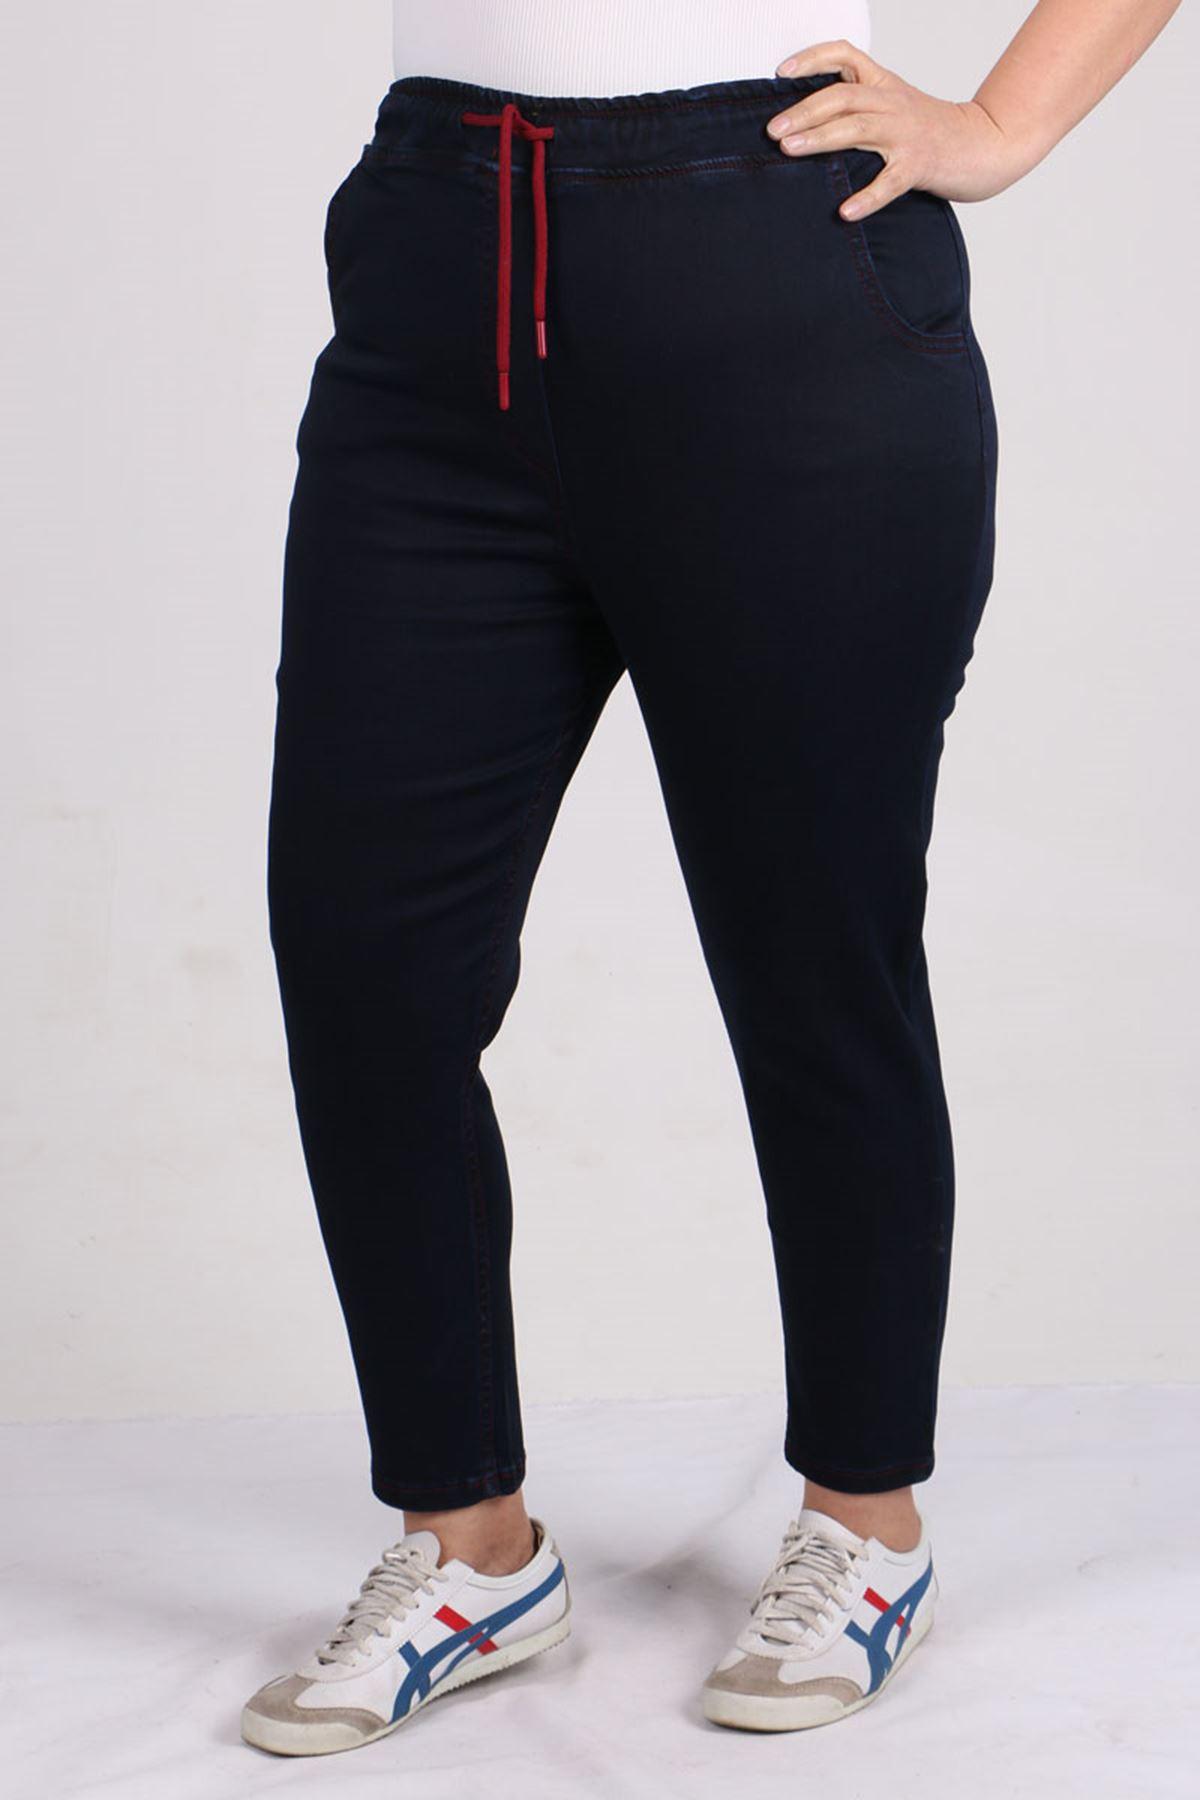 9136 Büyük Beden Beli Lastikli Mom Jeans Pantolon Koyu Lacivert - Bordo